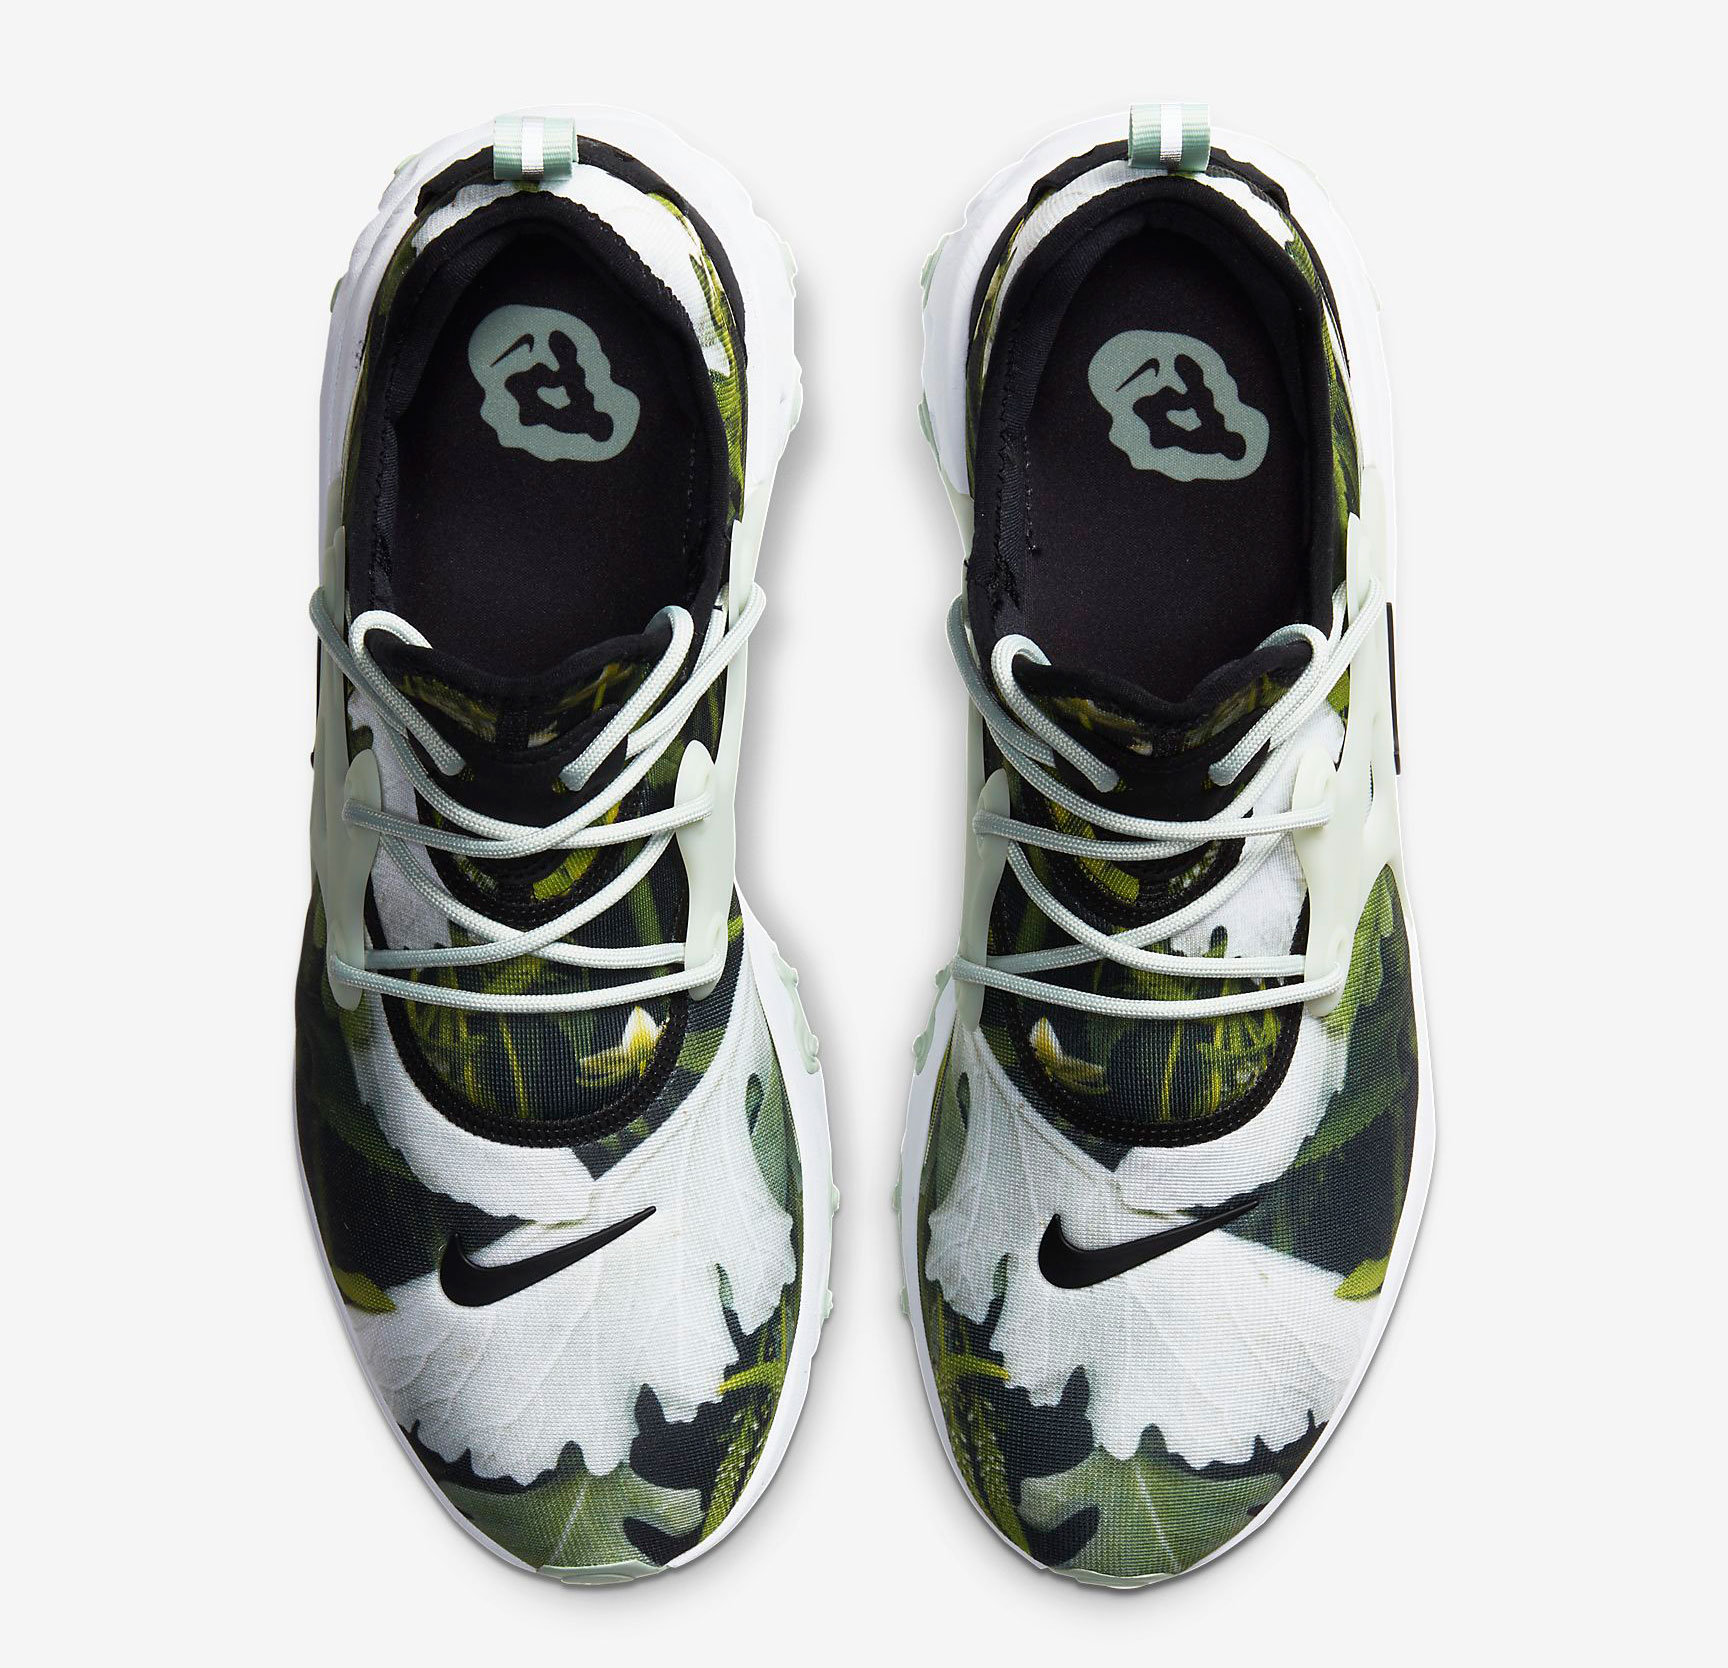 nike-react-presto-floral-green-4